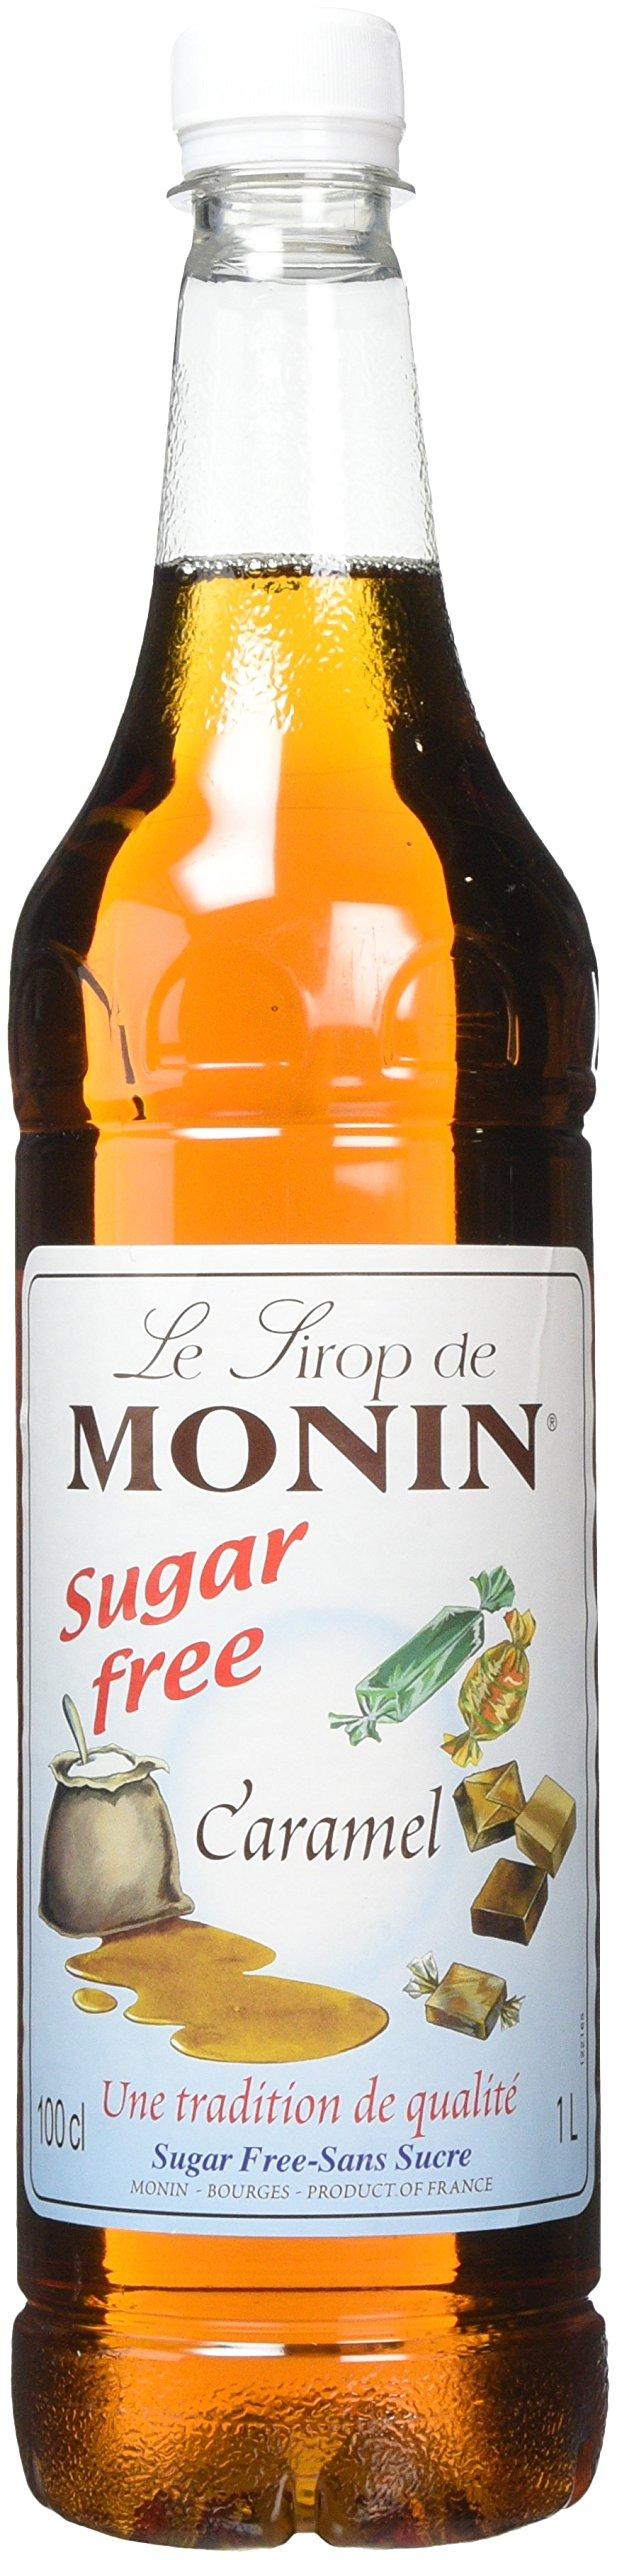 Monin-Premium-Caramel-Sugar-Free-Syrup-1-L